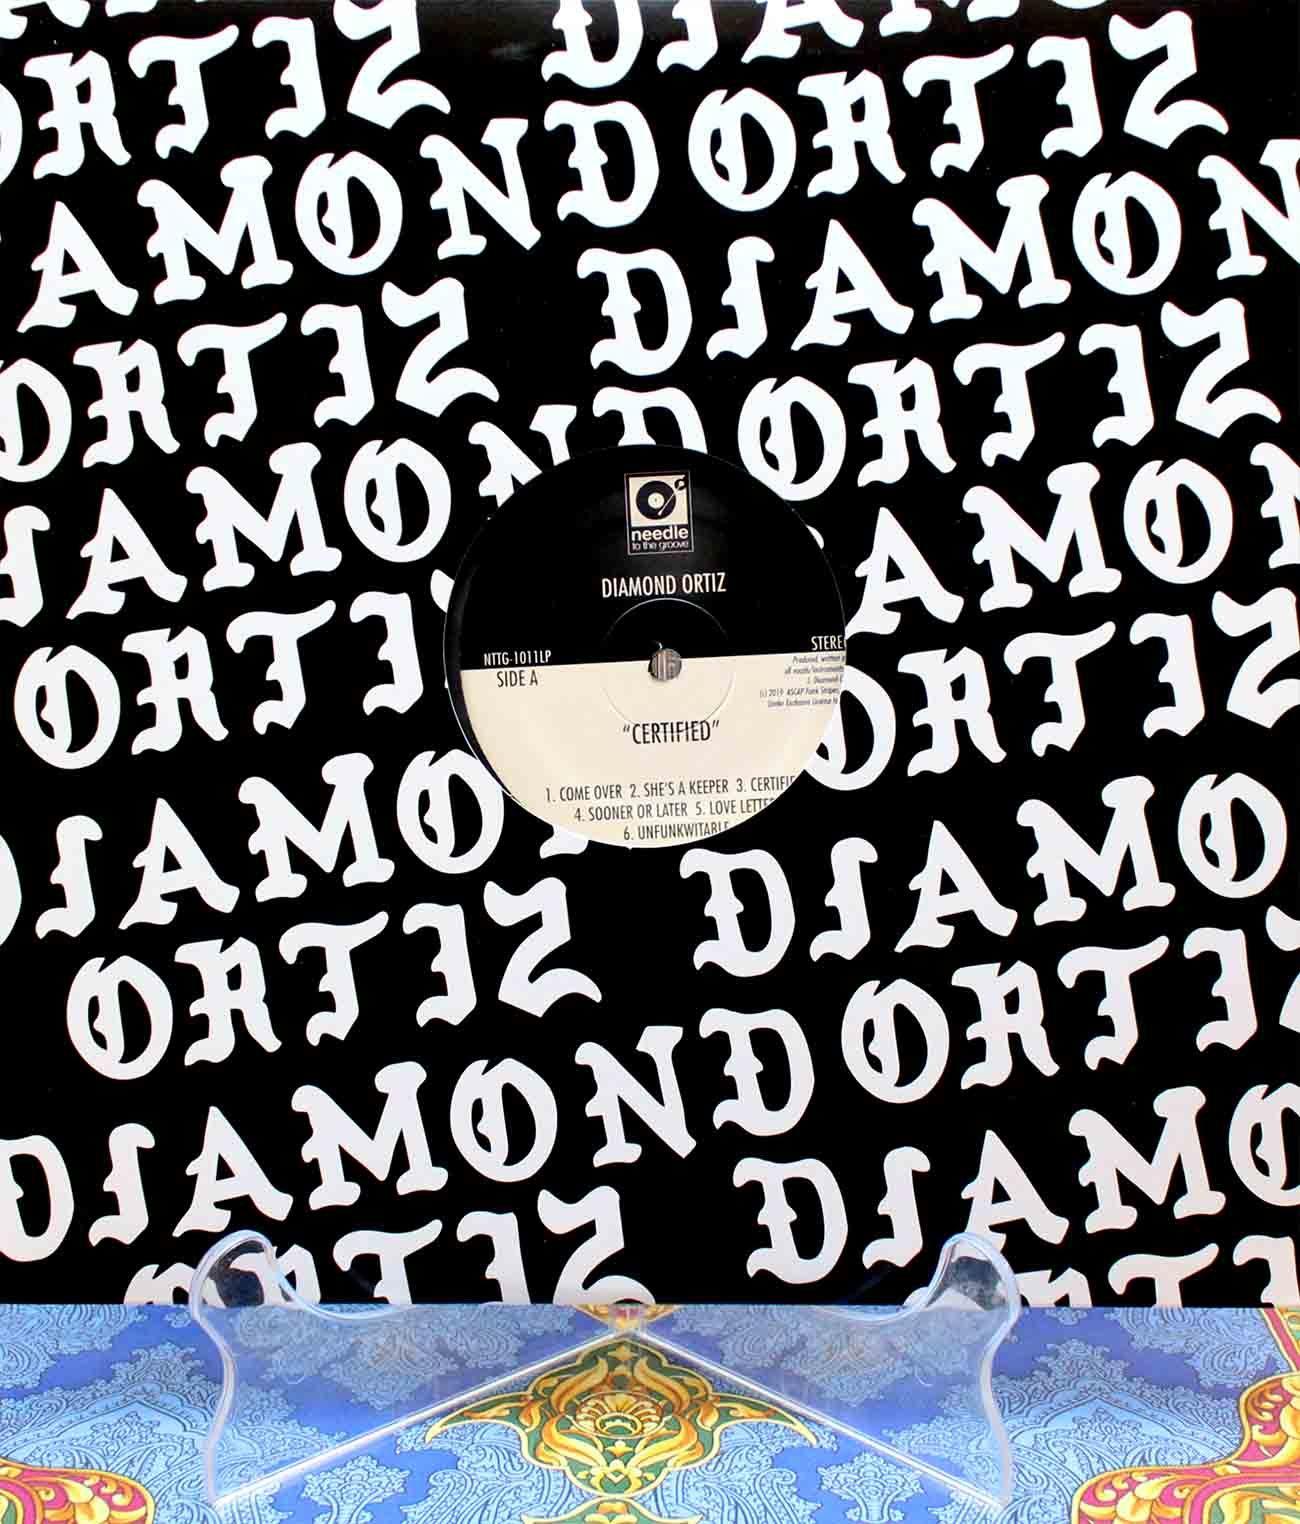 Diamond Ortiz – Certified 01